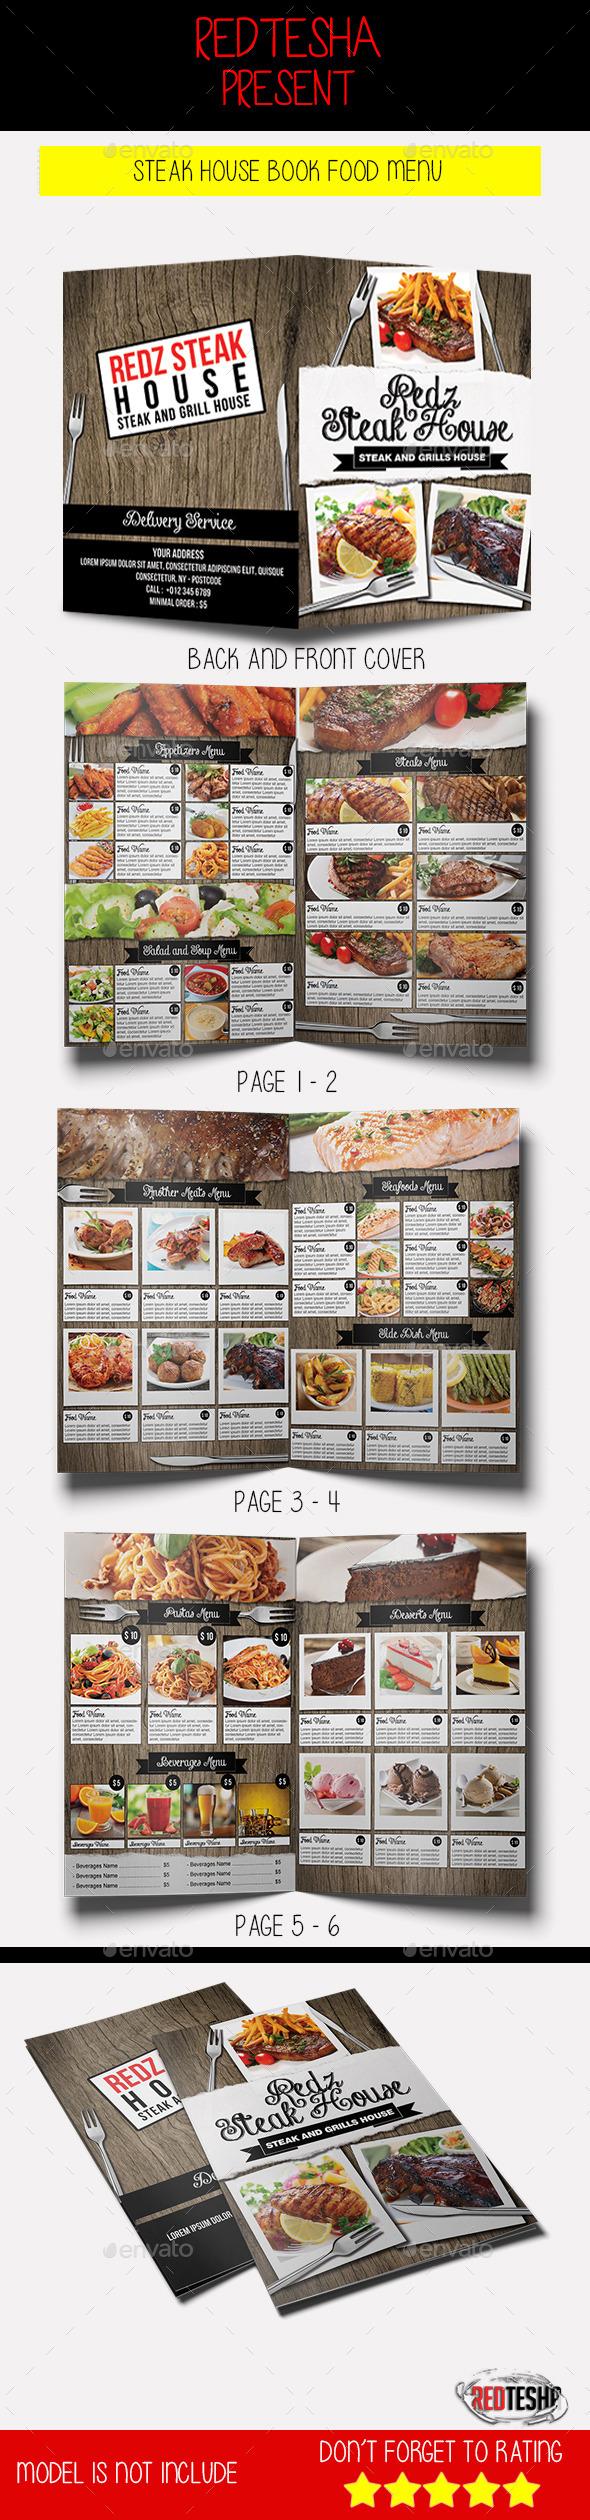 Steak House Book Food Menu